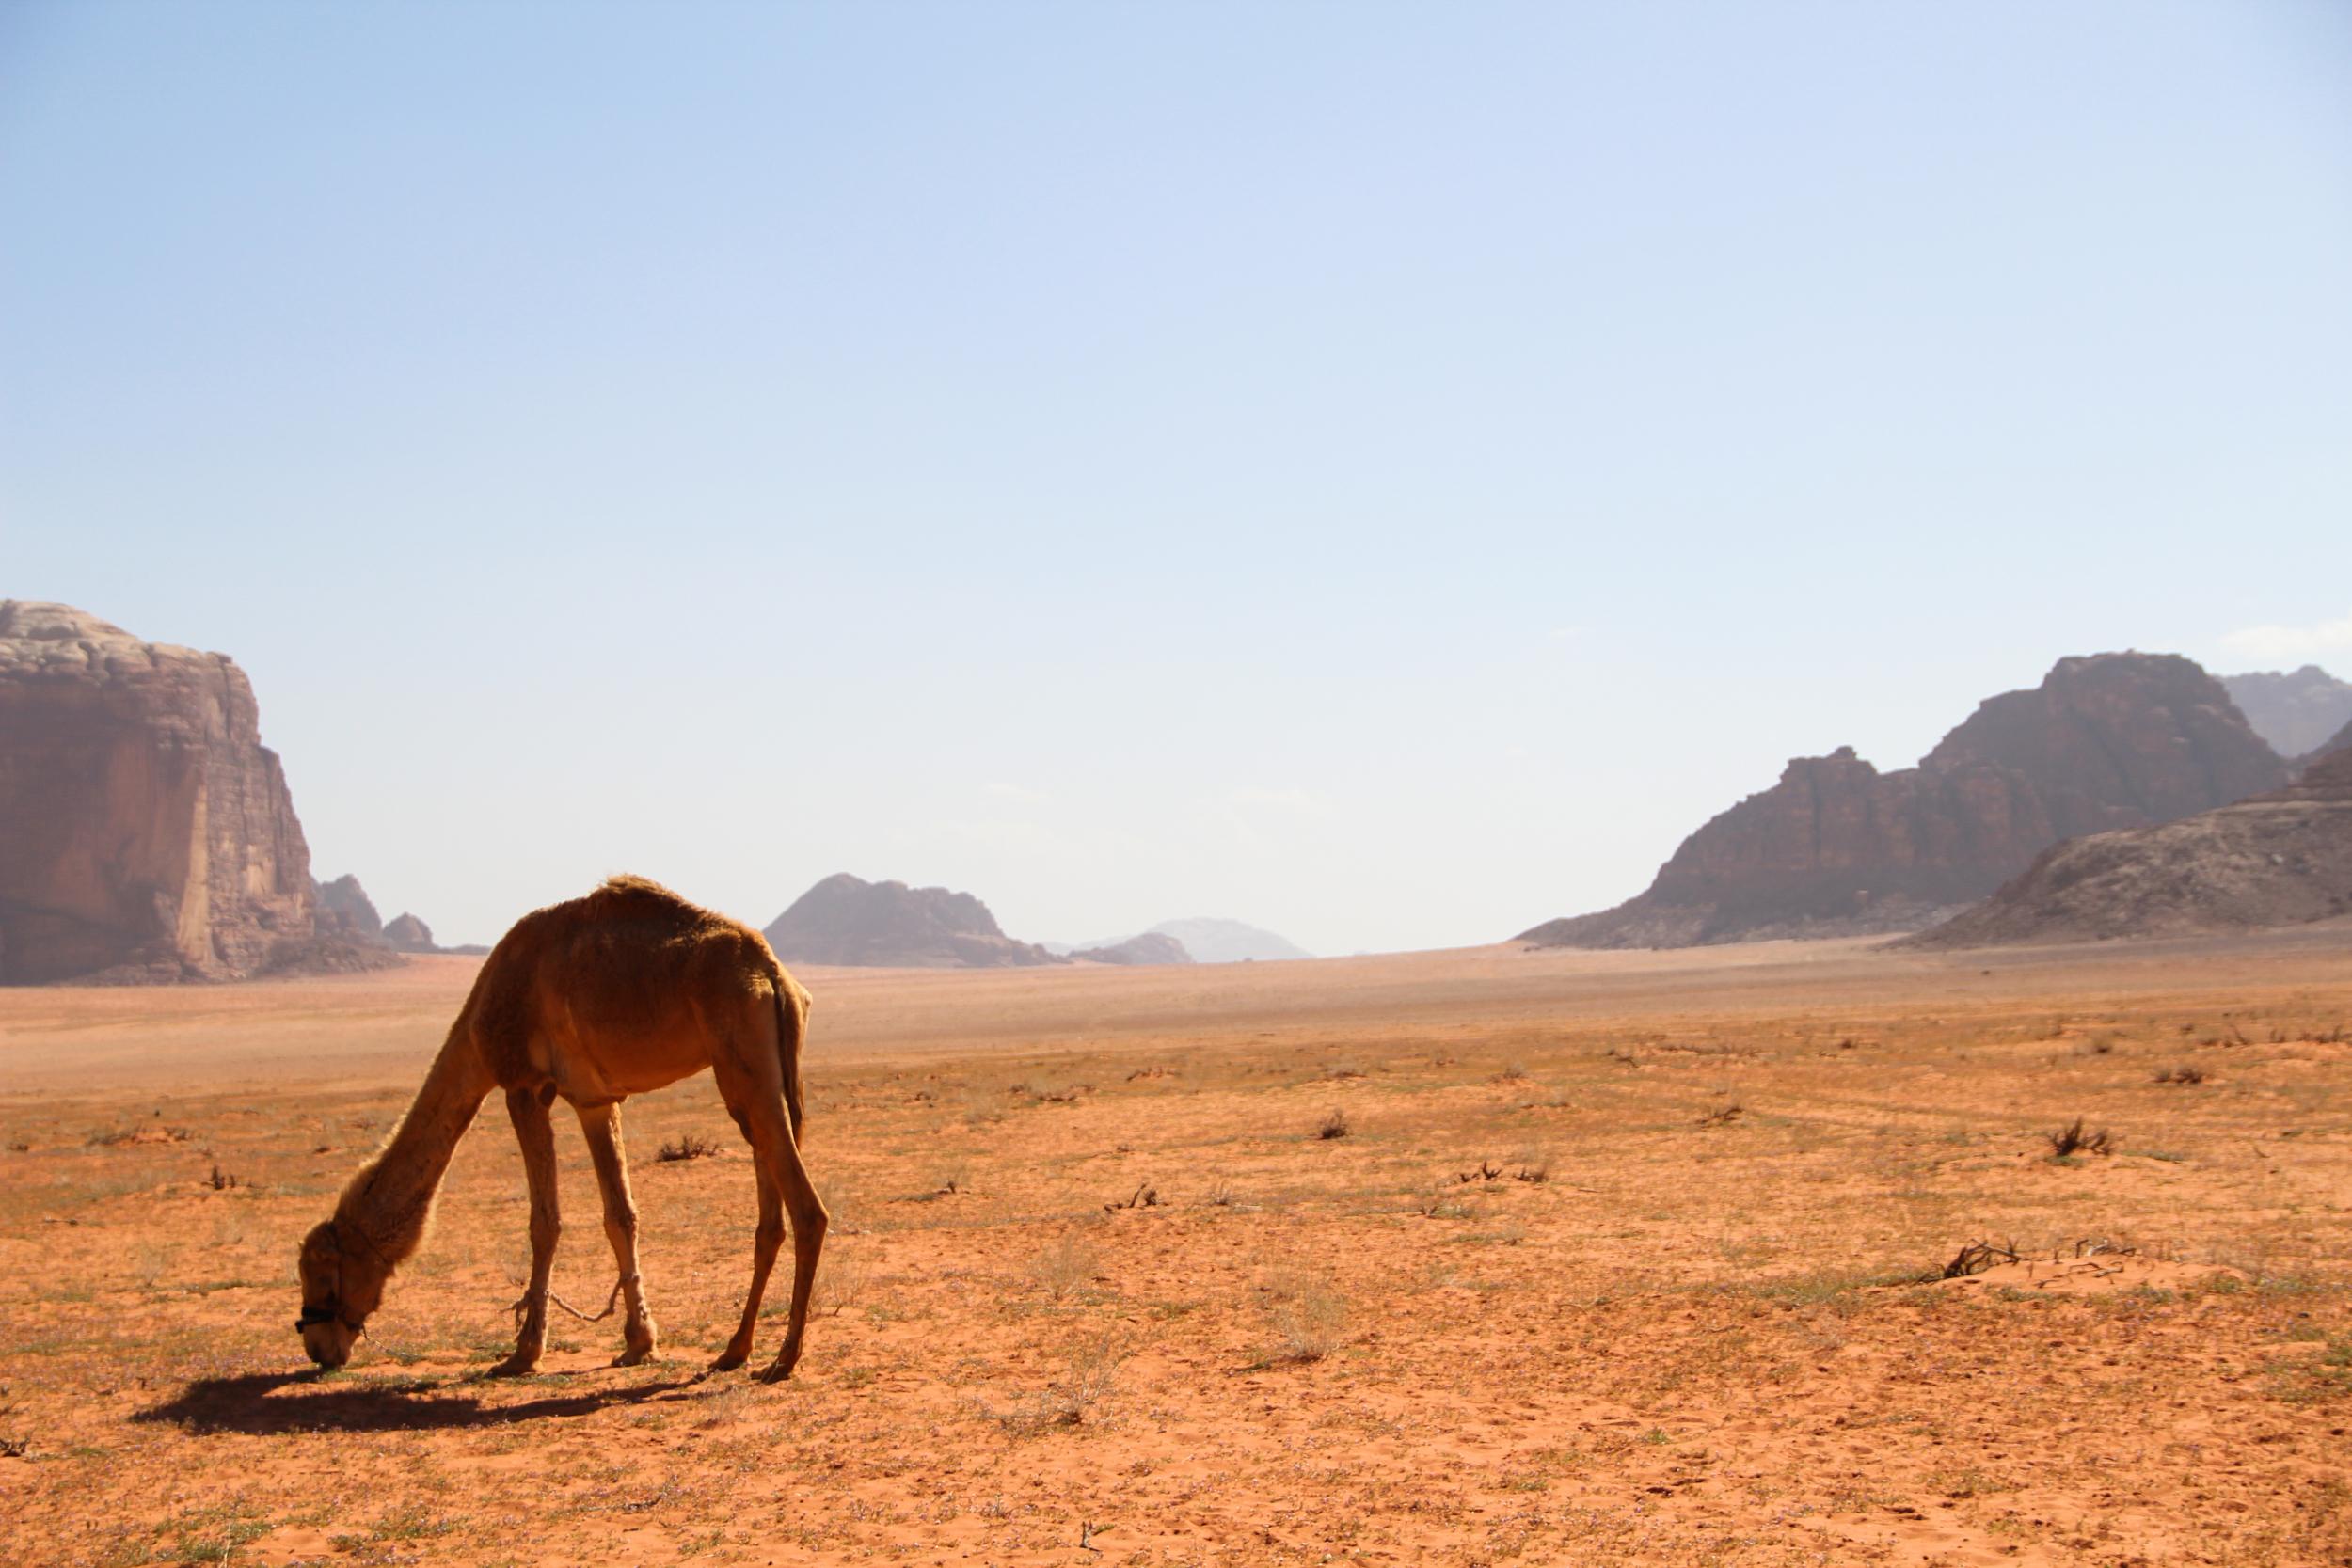 Wadi Rum, March 2014